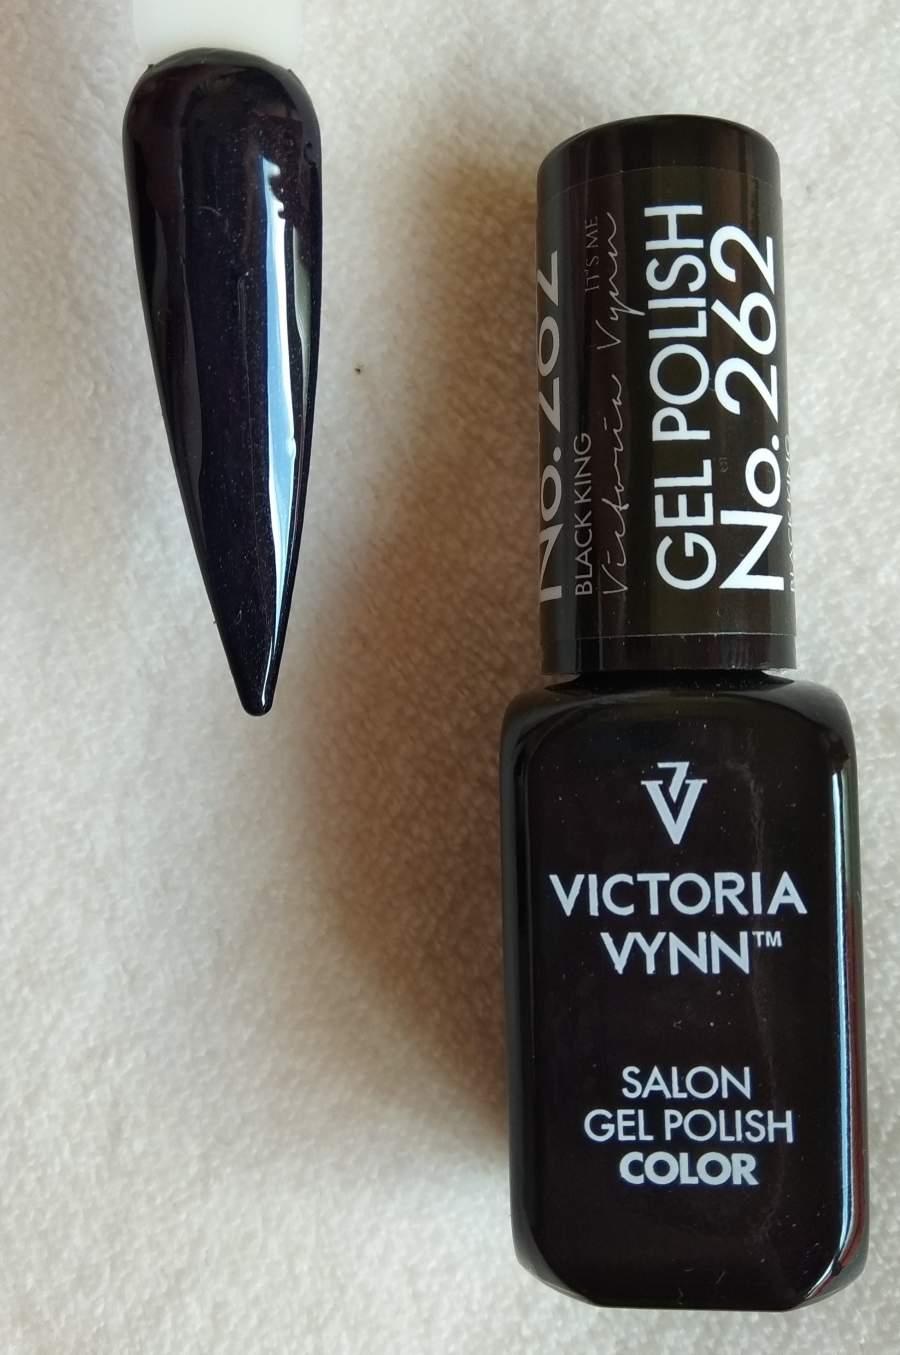 Victoria Vynn Verniz Gel Nº 292 - Black King - 8 ml